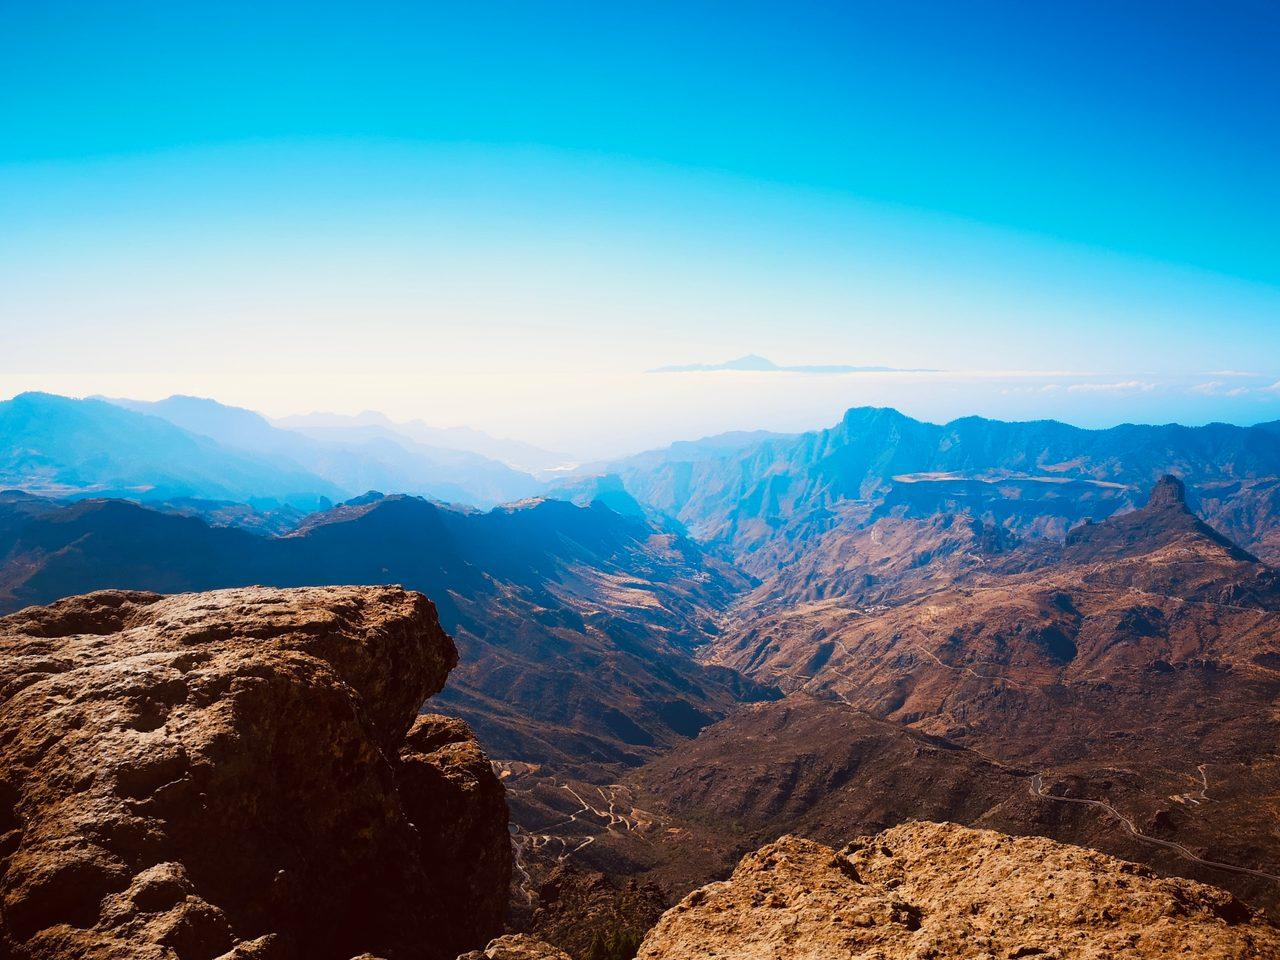 Natural landscape, Sky, Mountain, Azure, Cloud, Highland, Sunlight, Slope, Terrain